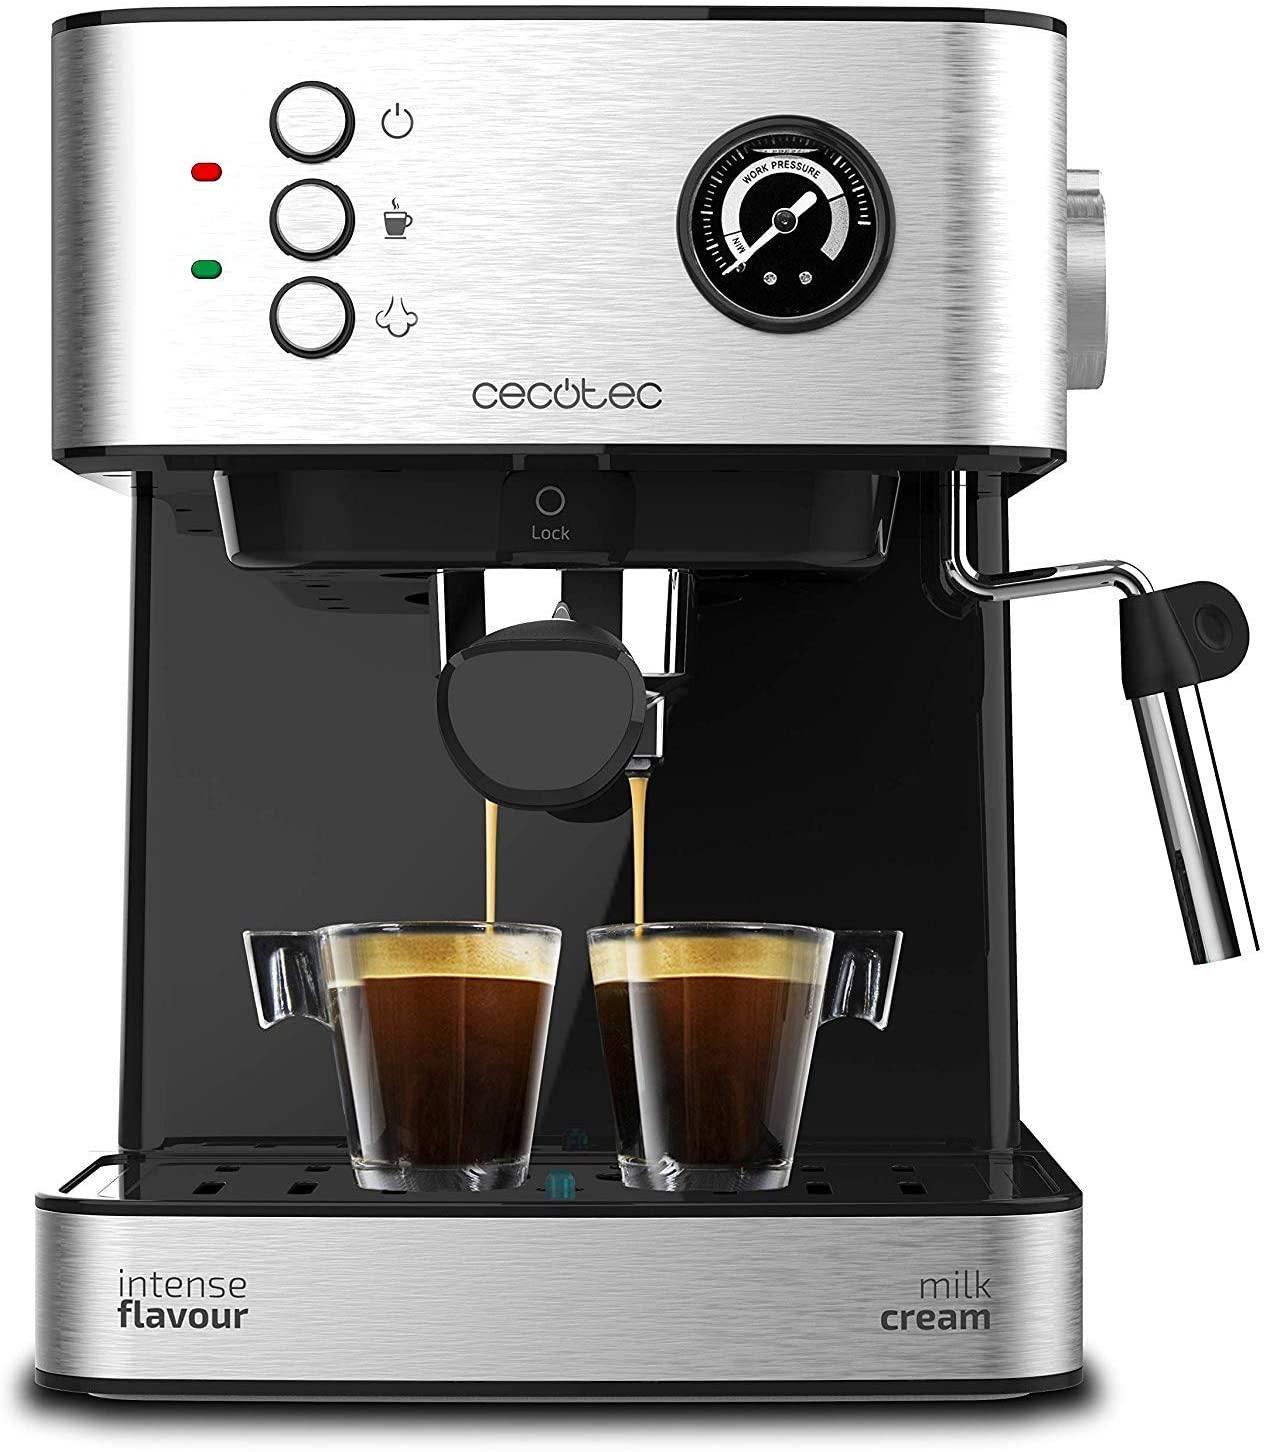 Espressor profesional Cecotec Power Espresso 20 Professionale, 850 W, 20 bar, 1.5 l, indicator luminos